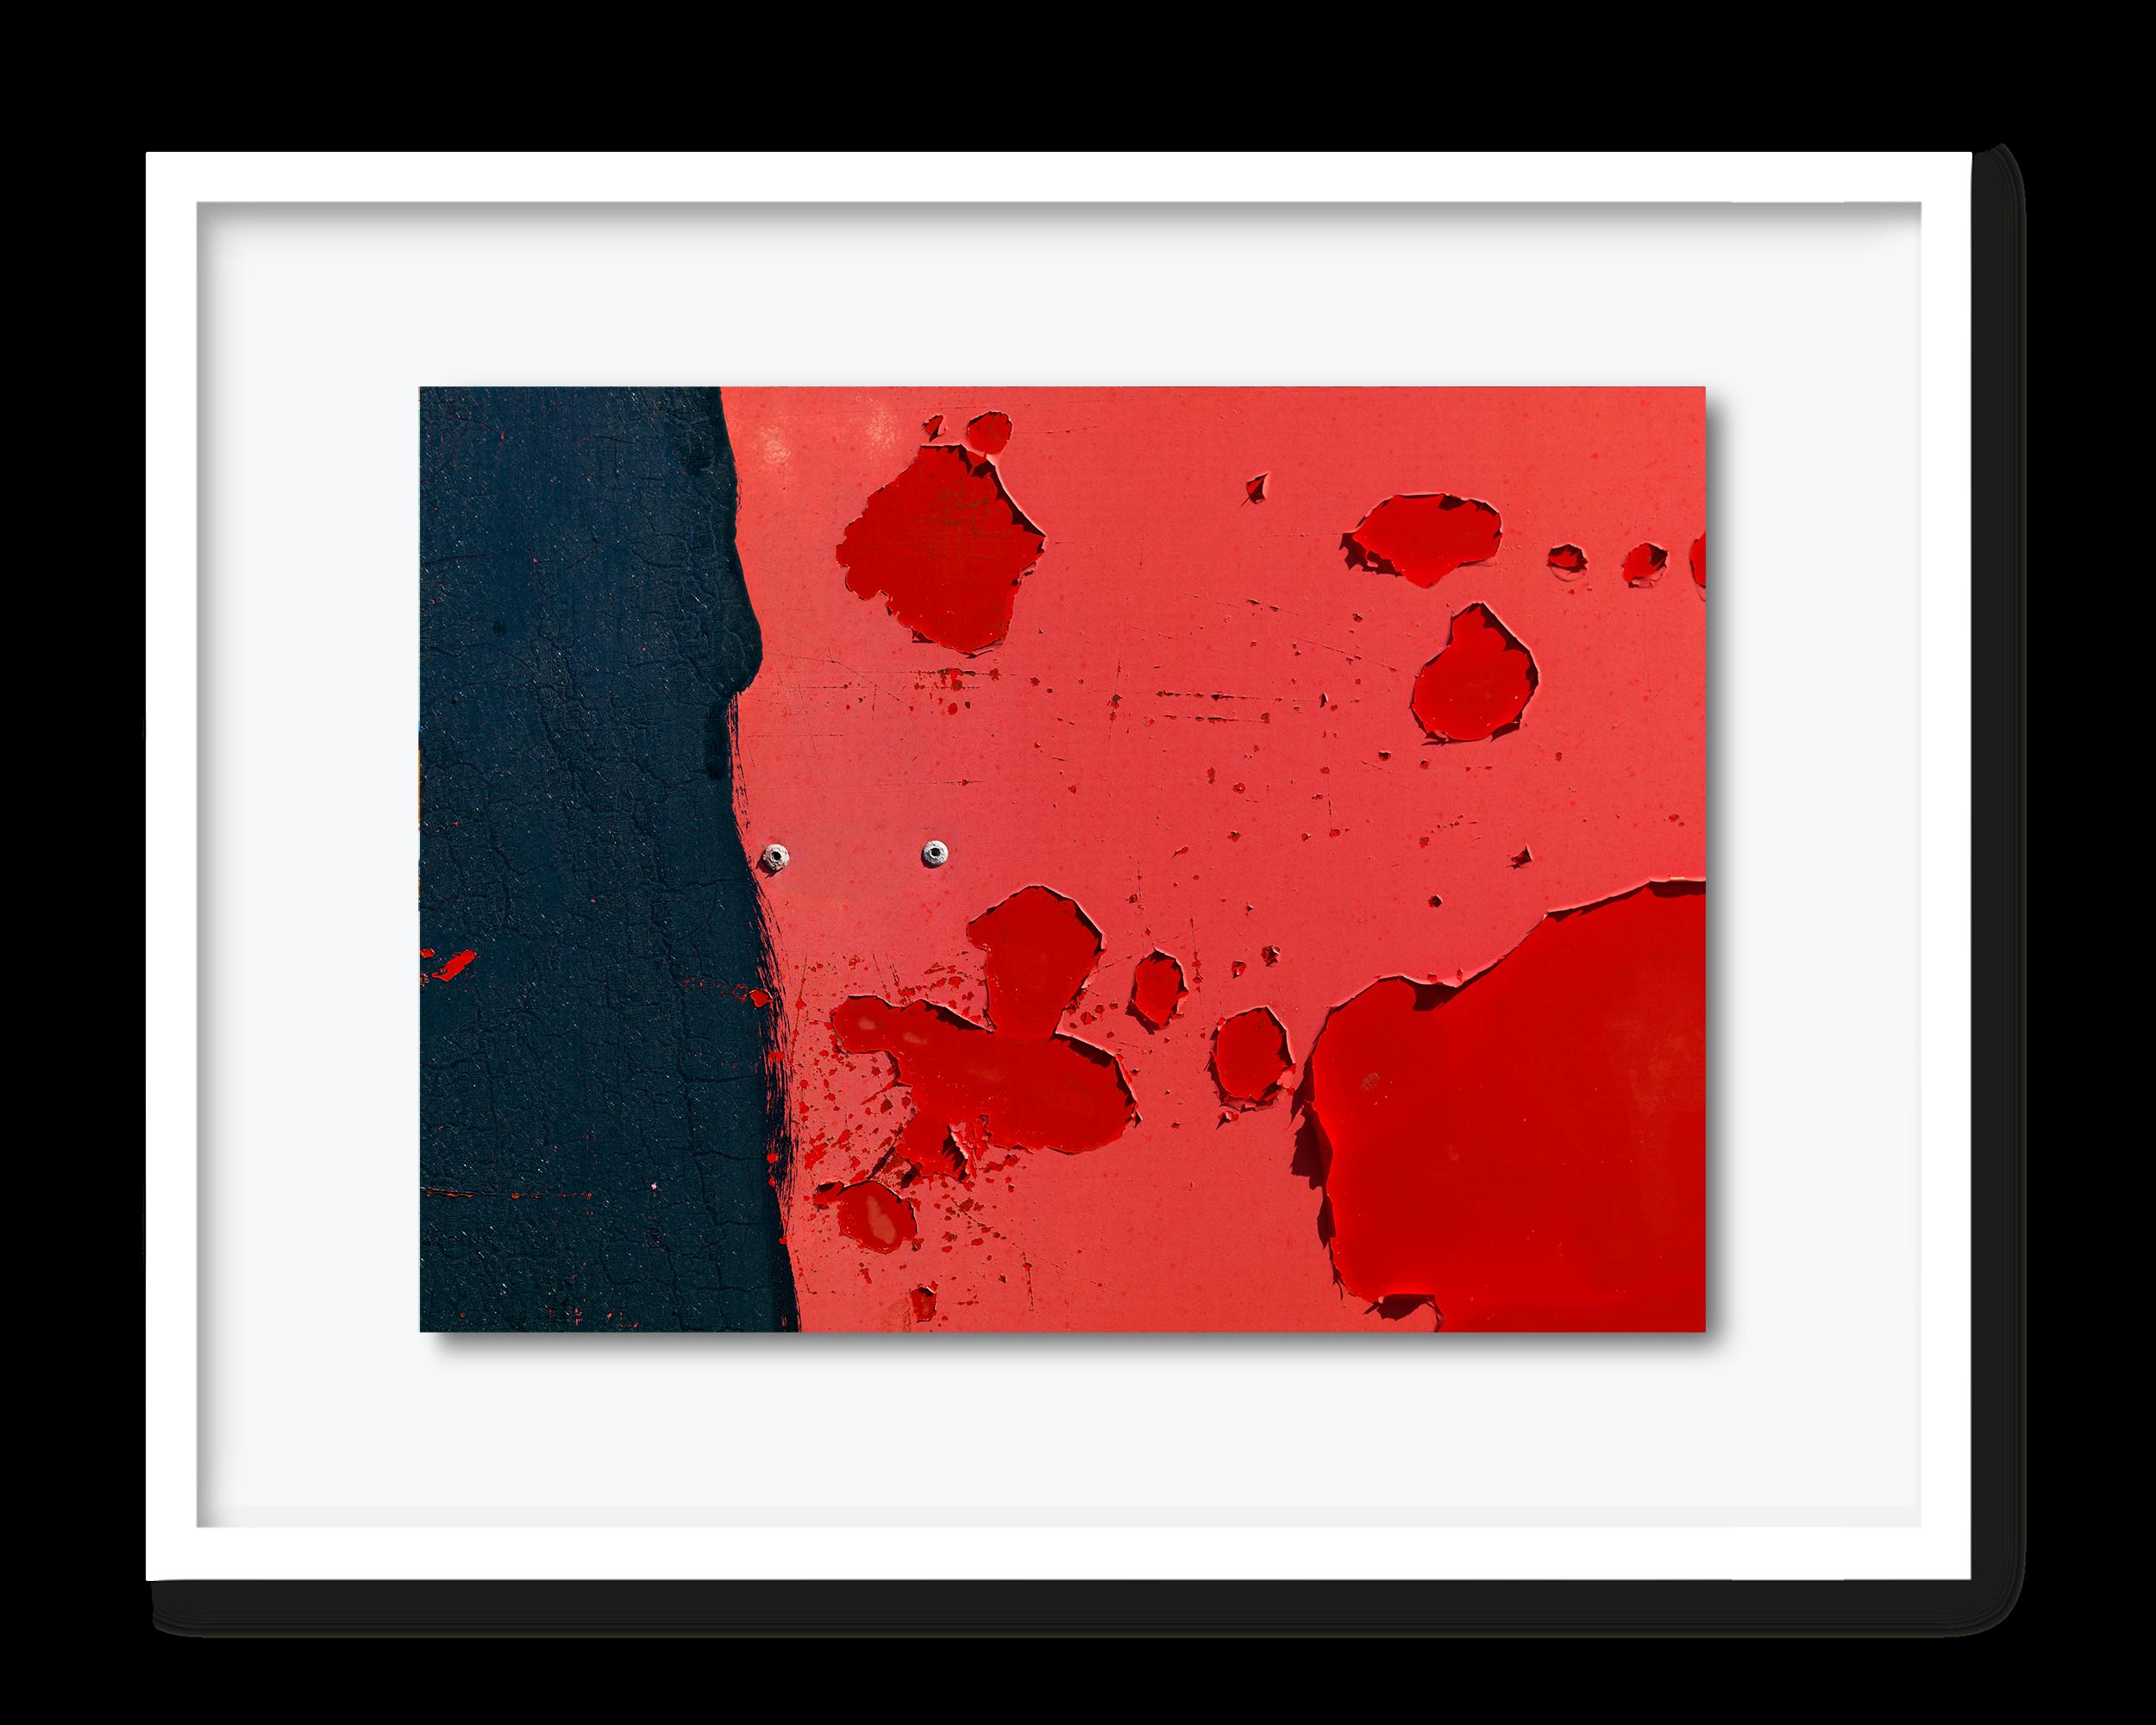 42.david-pearce-peeling-paint4.png